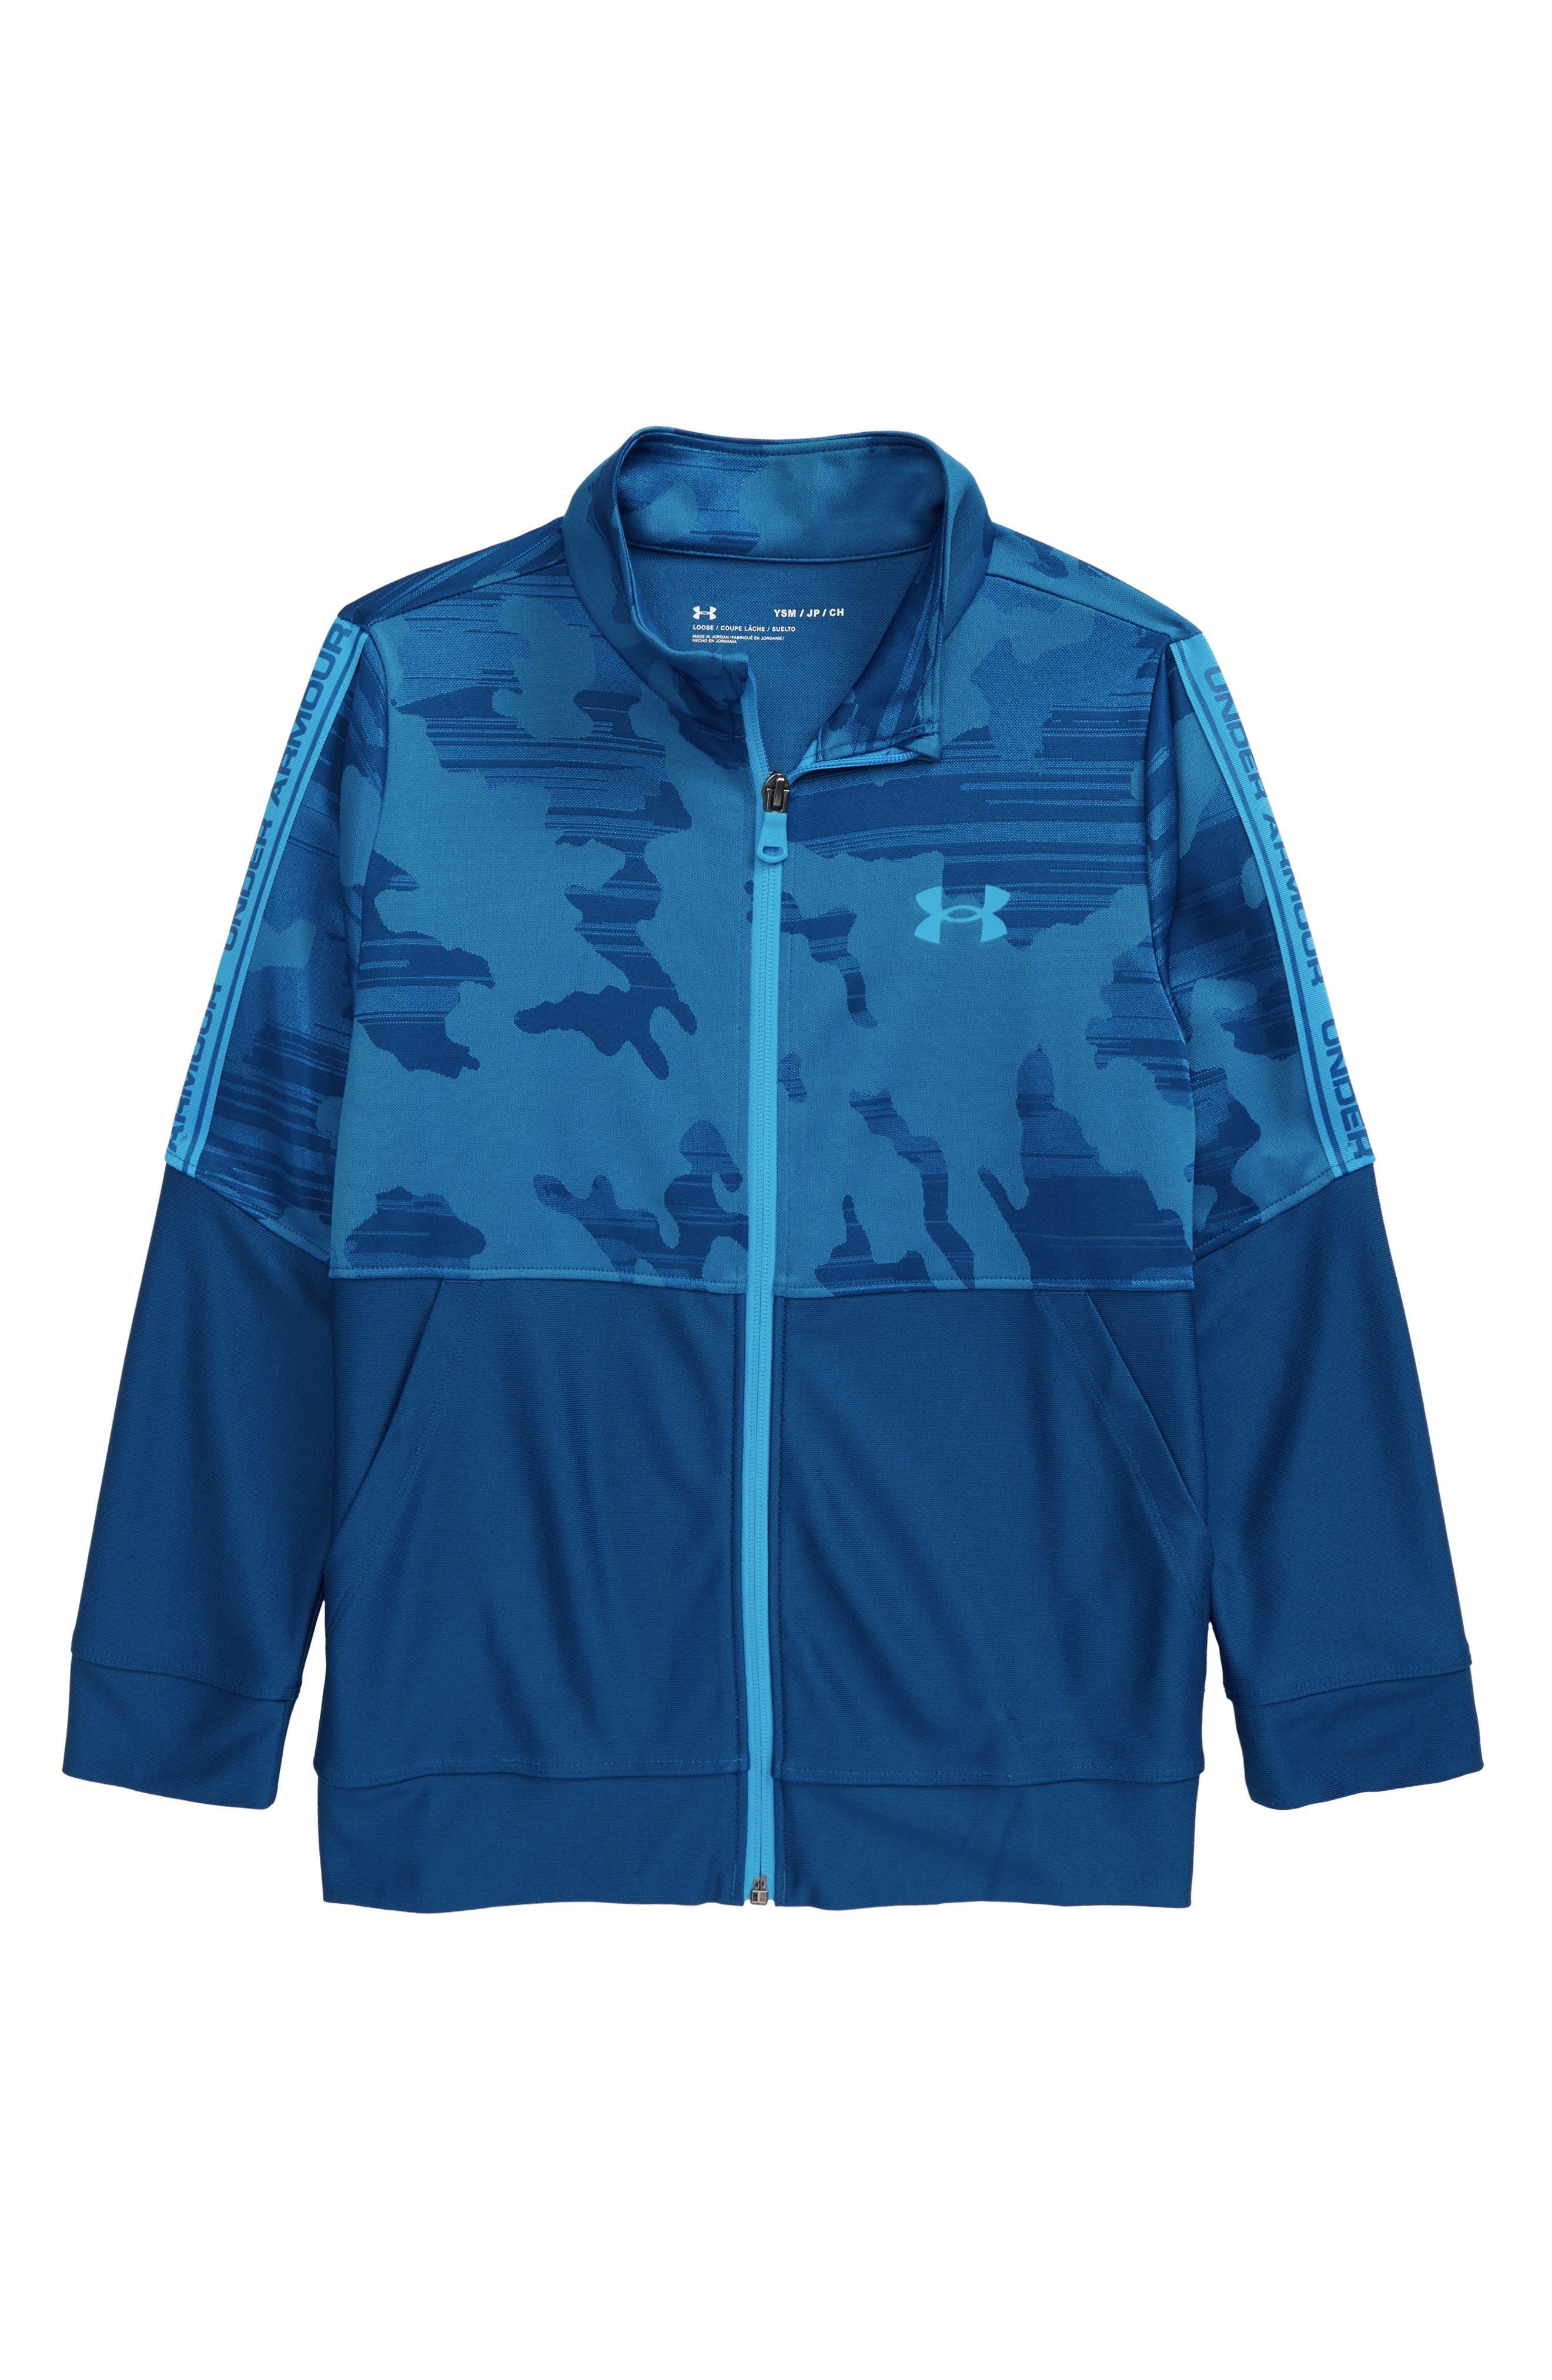 New Boys Under Armour Jacket Baseball Coat Button Up Black Size 4 5 6